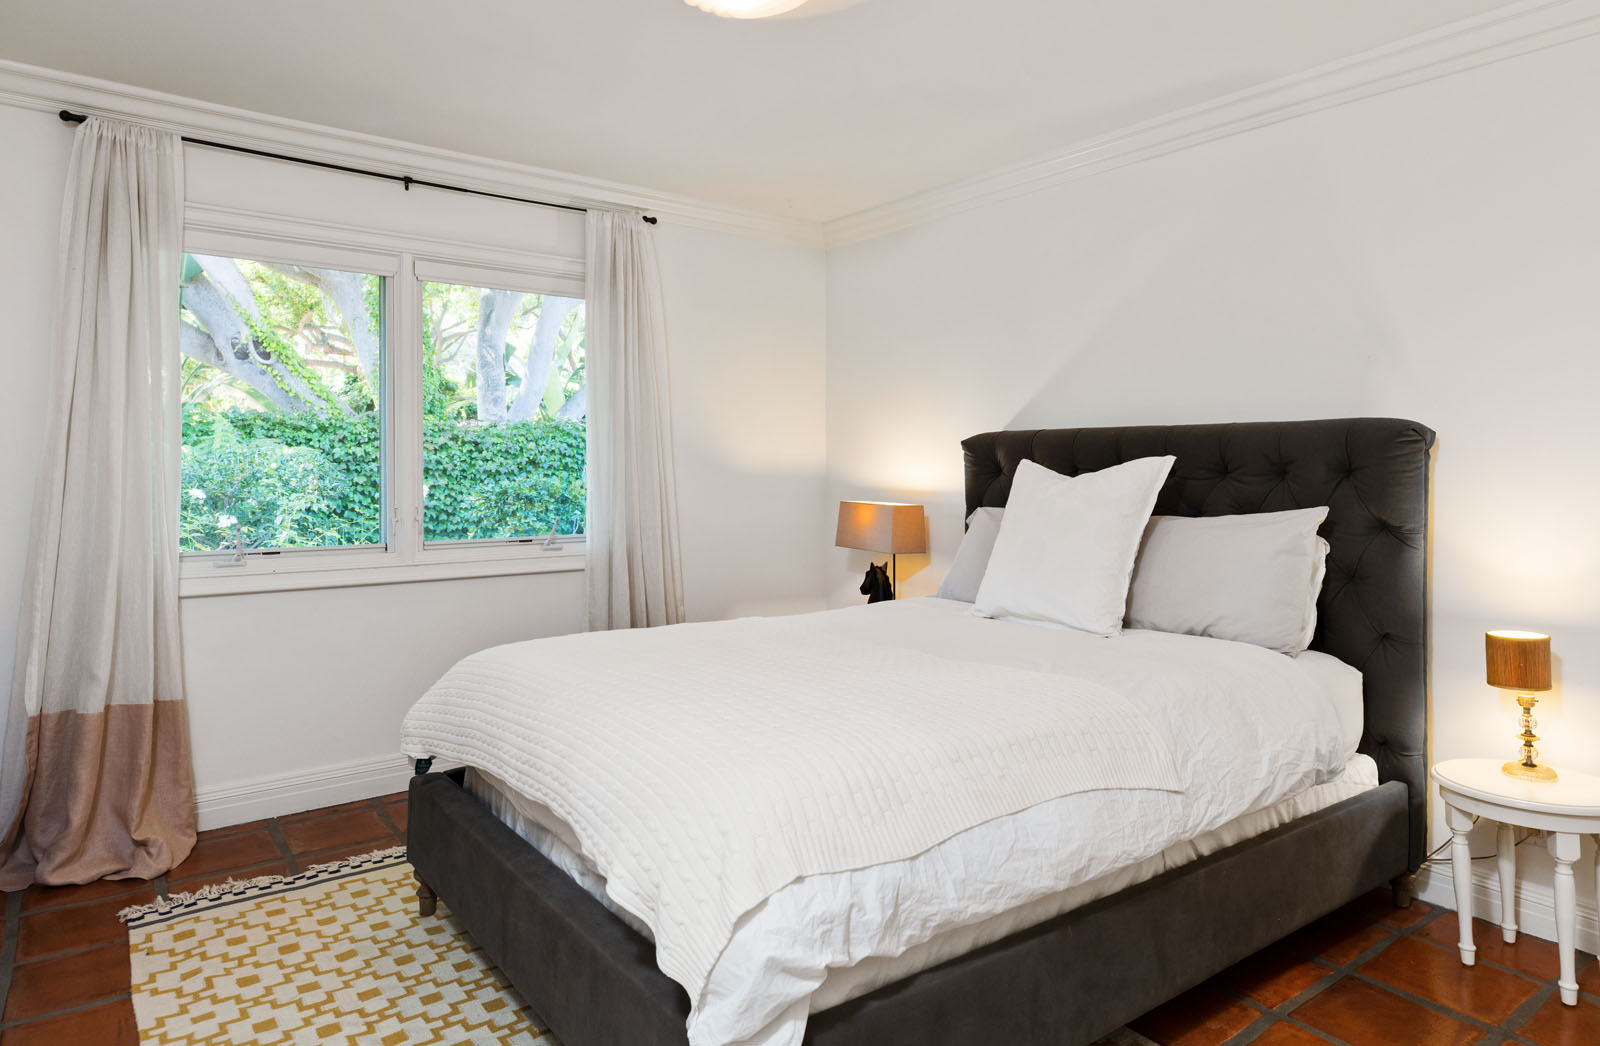 024 Bedroom 1712 Manzanita Park Avenue Malibu For Sale Lease The Malibu Life Team Luxury Real Estate.jpg